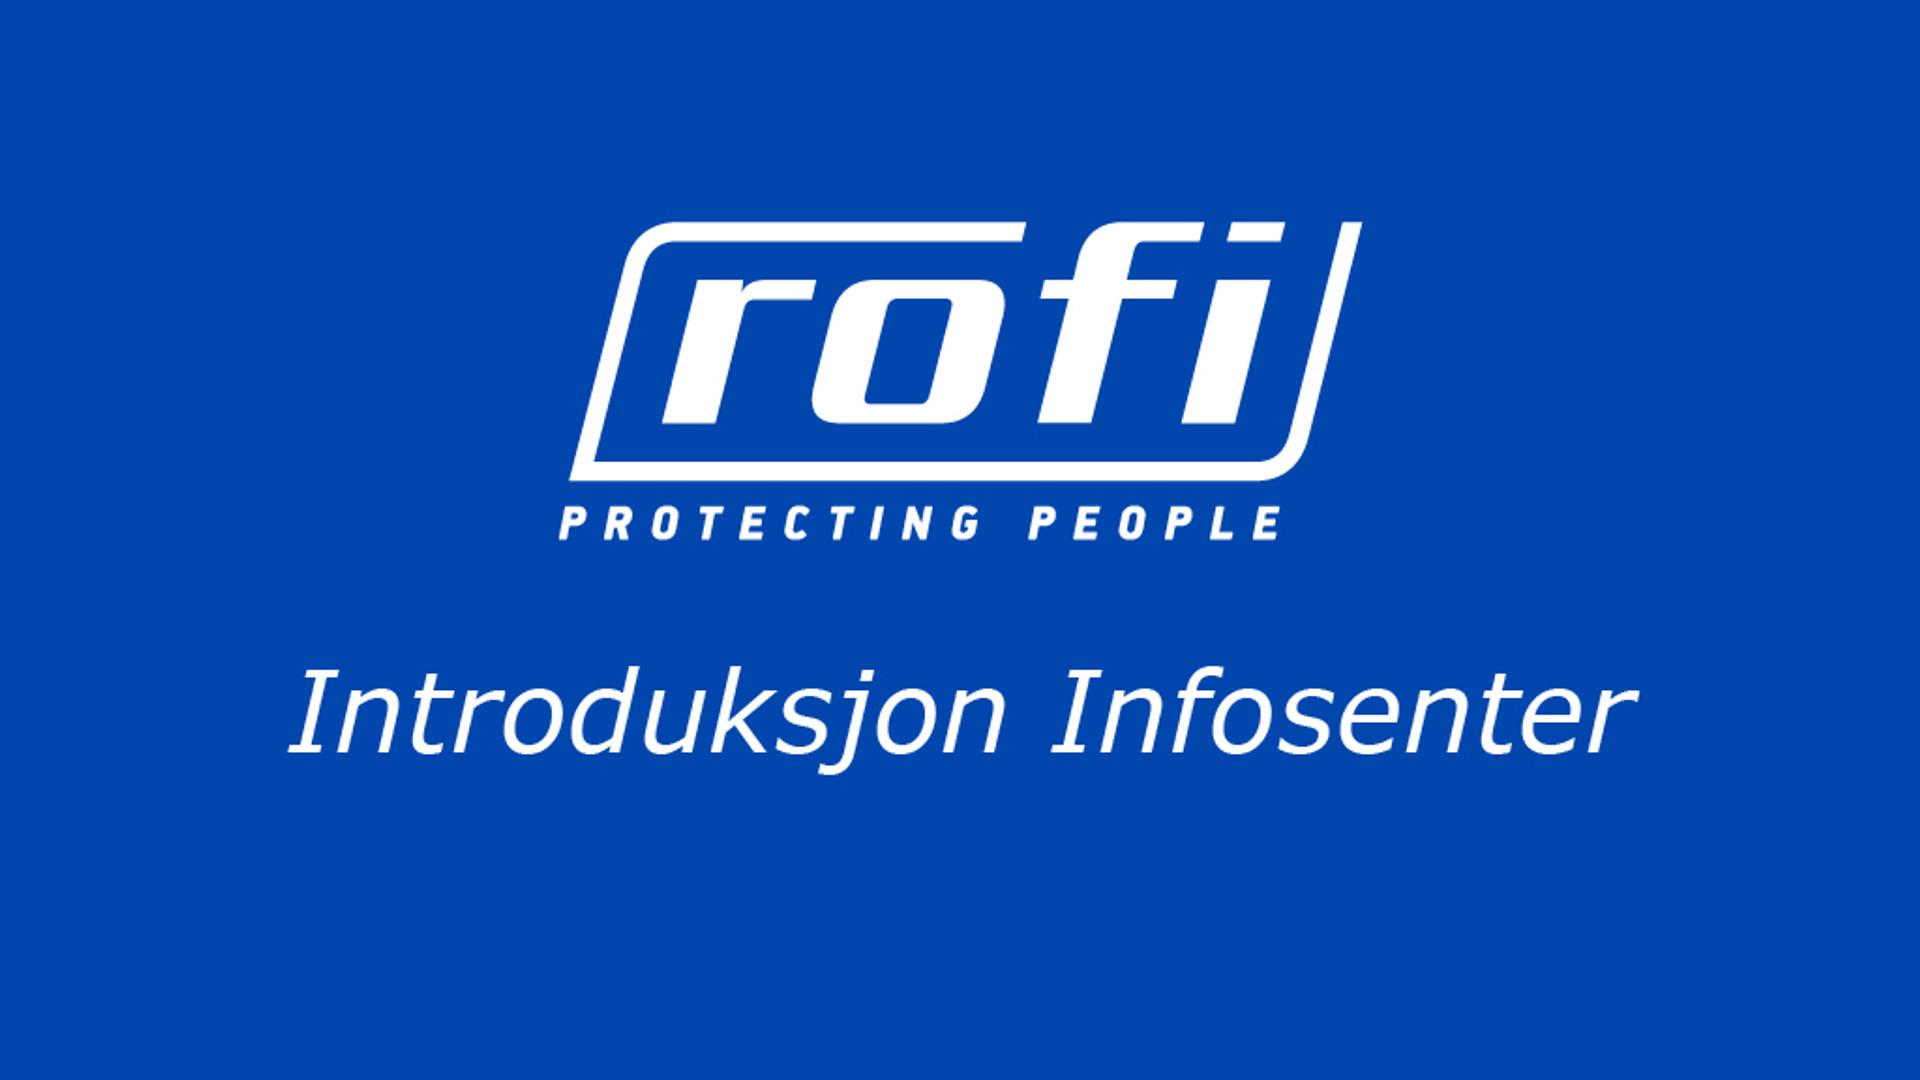 Introduksjon ROFI Infosenter